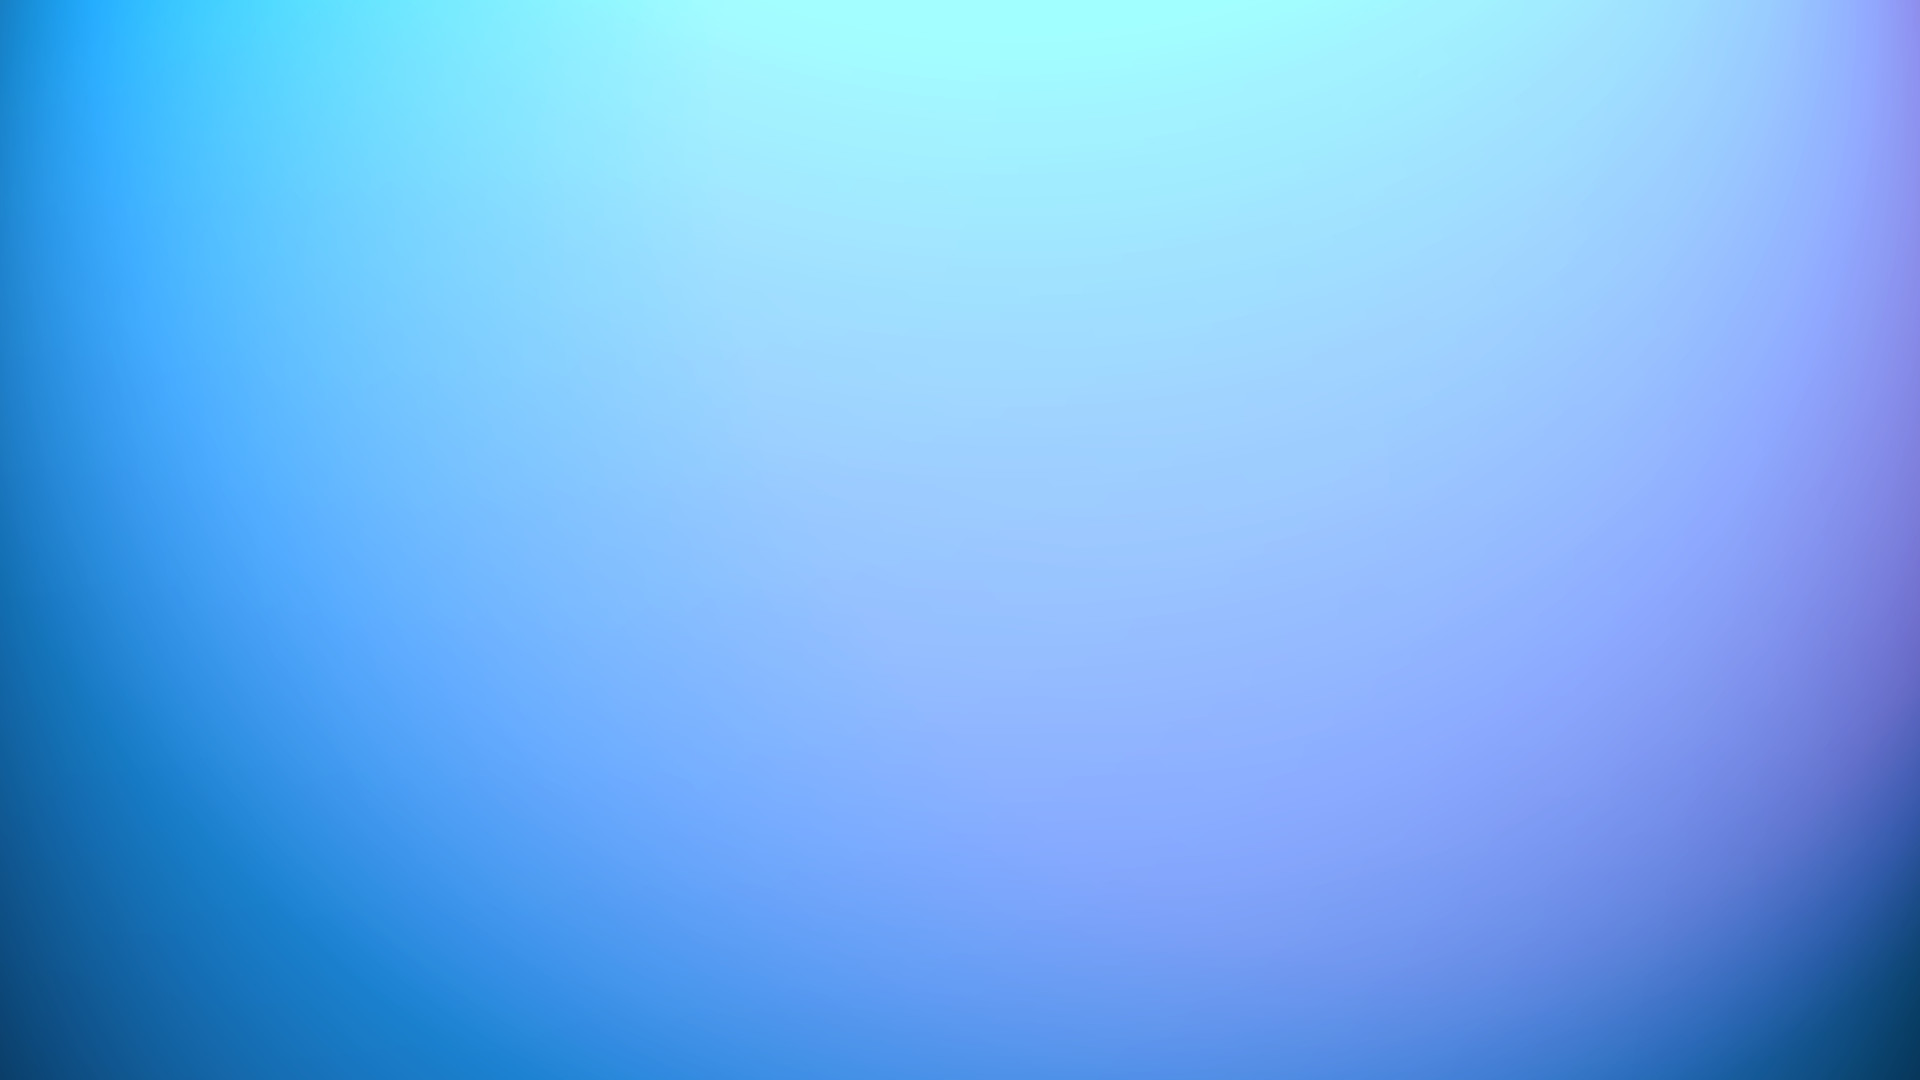 Blue gradient HD Wallpaper 1920×1080